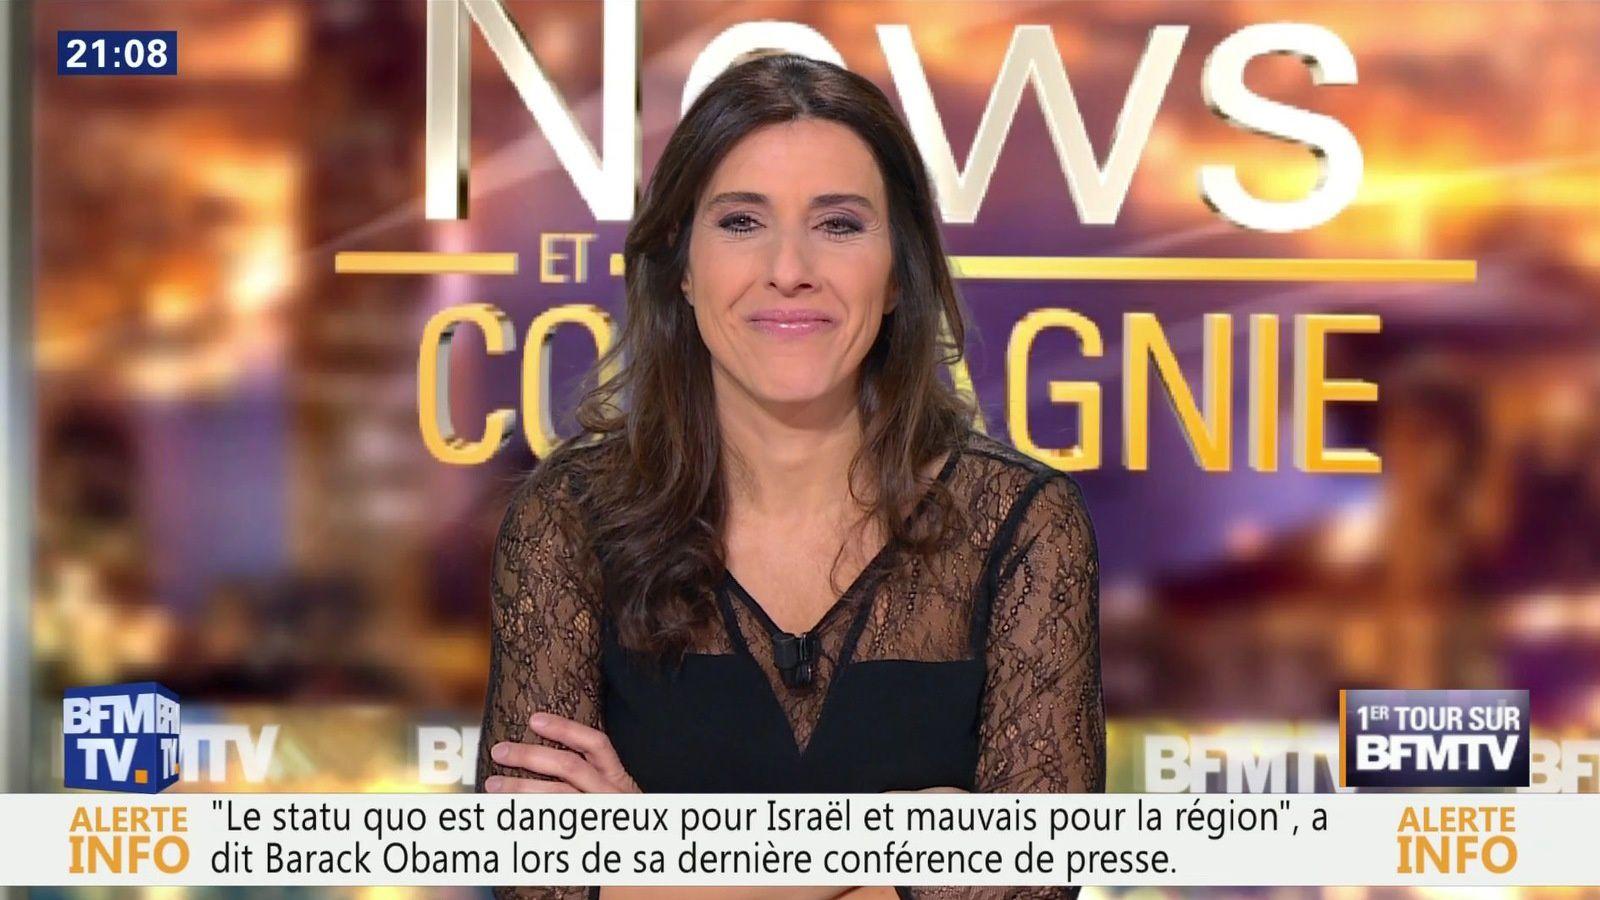 �8 NATHALIE LEVY @NathalieLevyNC @nthl_l @JohannaCarlosD8 ce soir pour #newsetco @bfmtv #vuesalatele